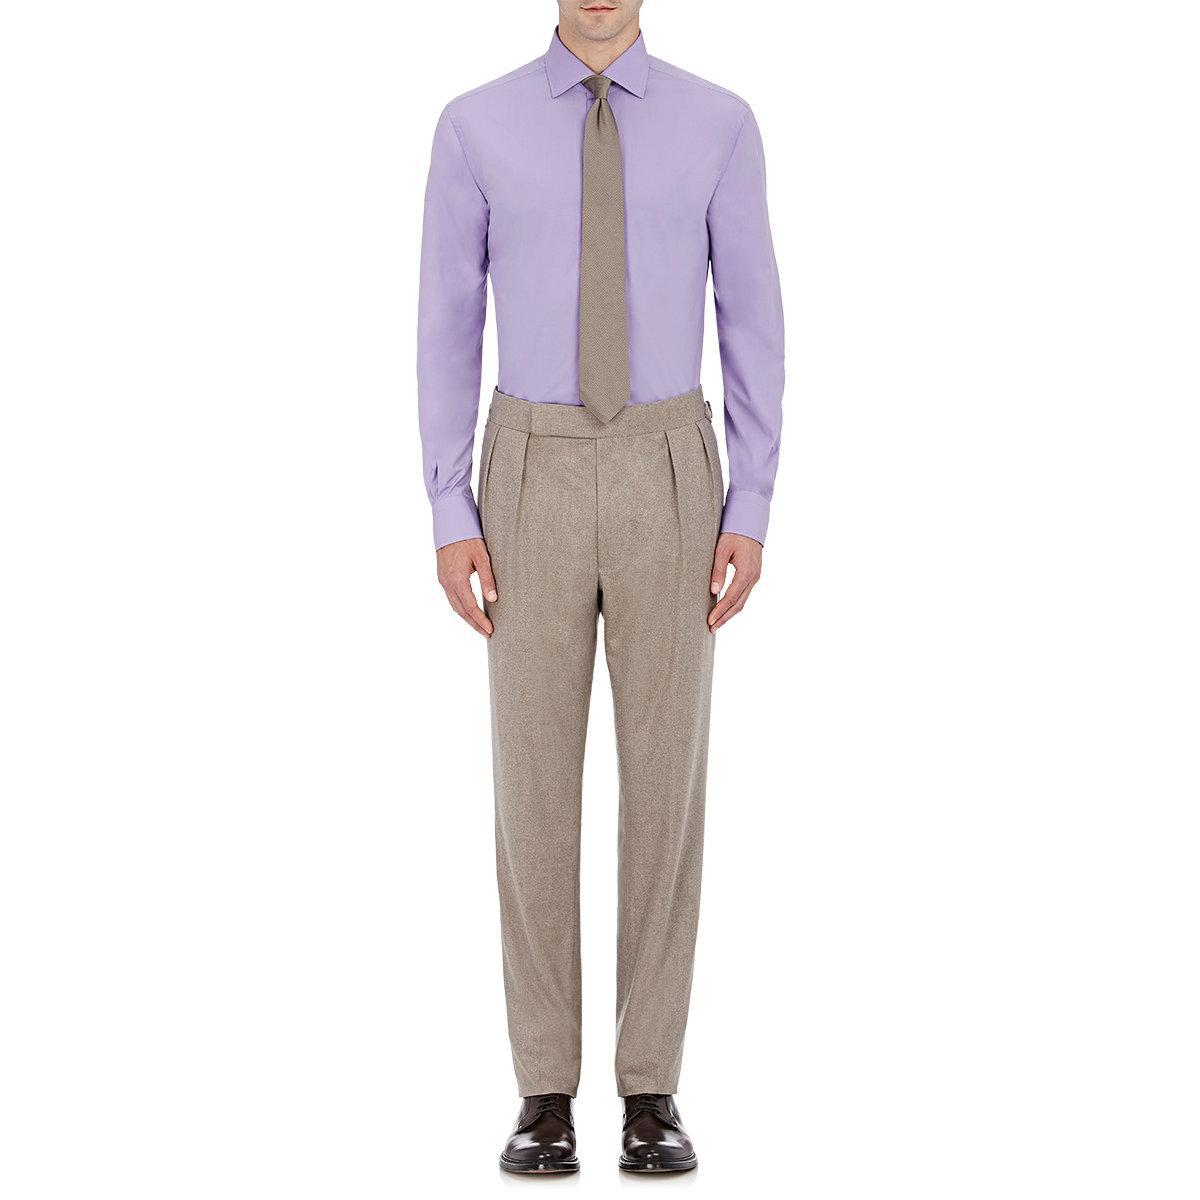 Lyst Ralph Lauren Purple Label Bond Cotton Dress Shirt